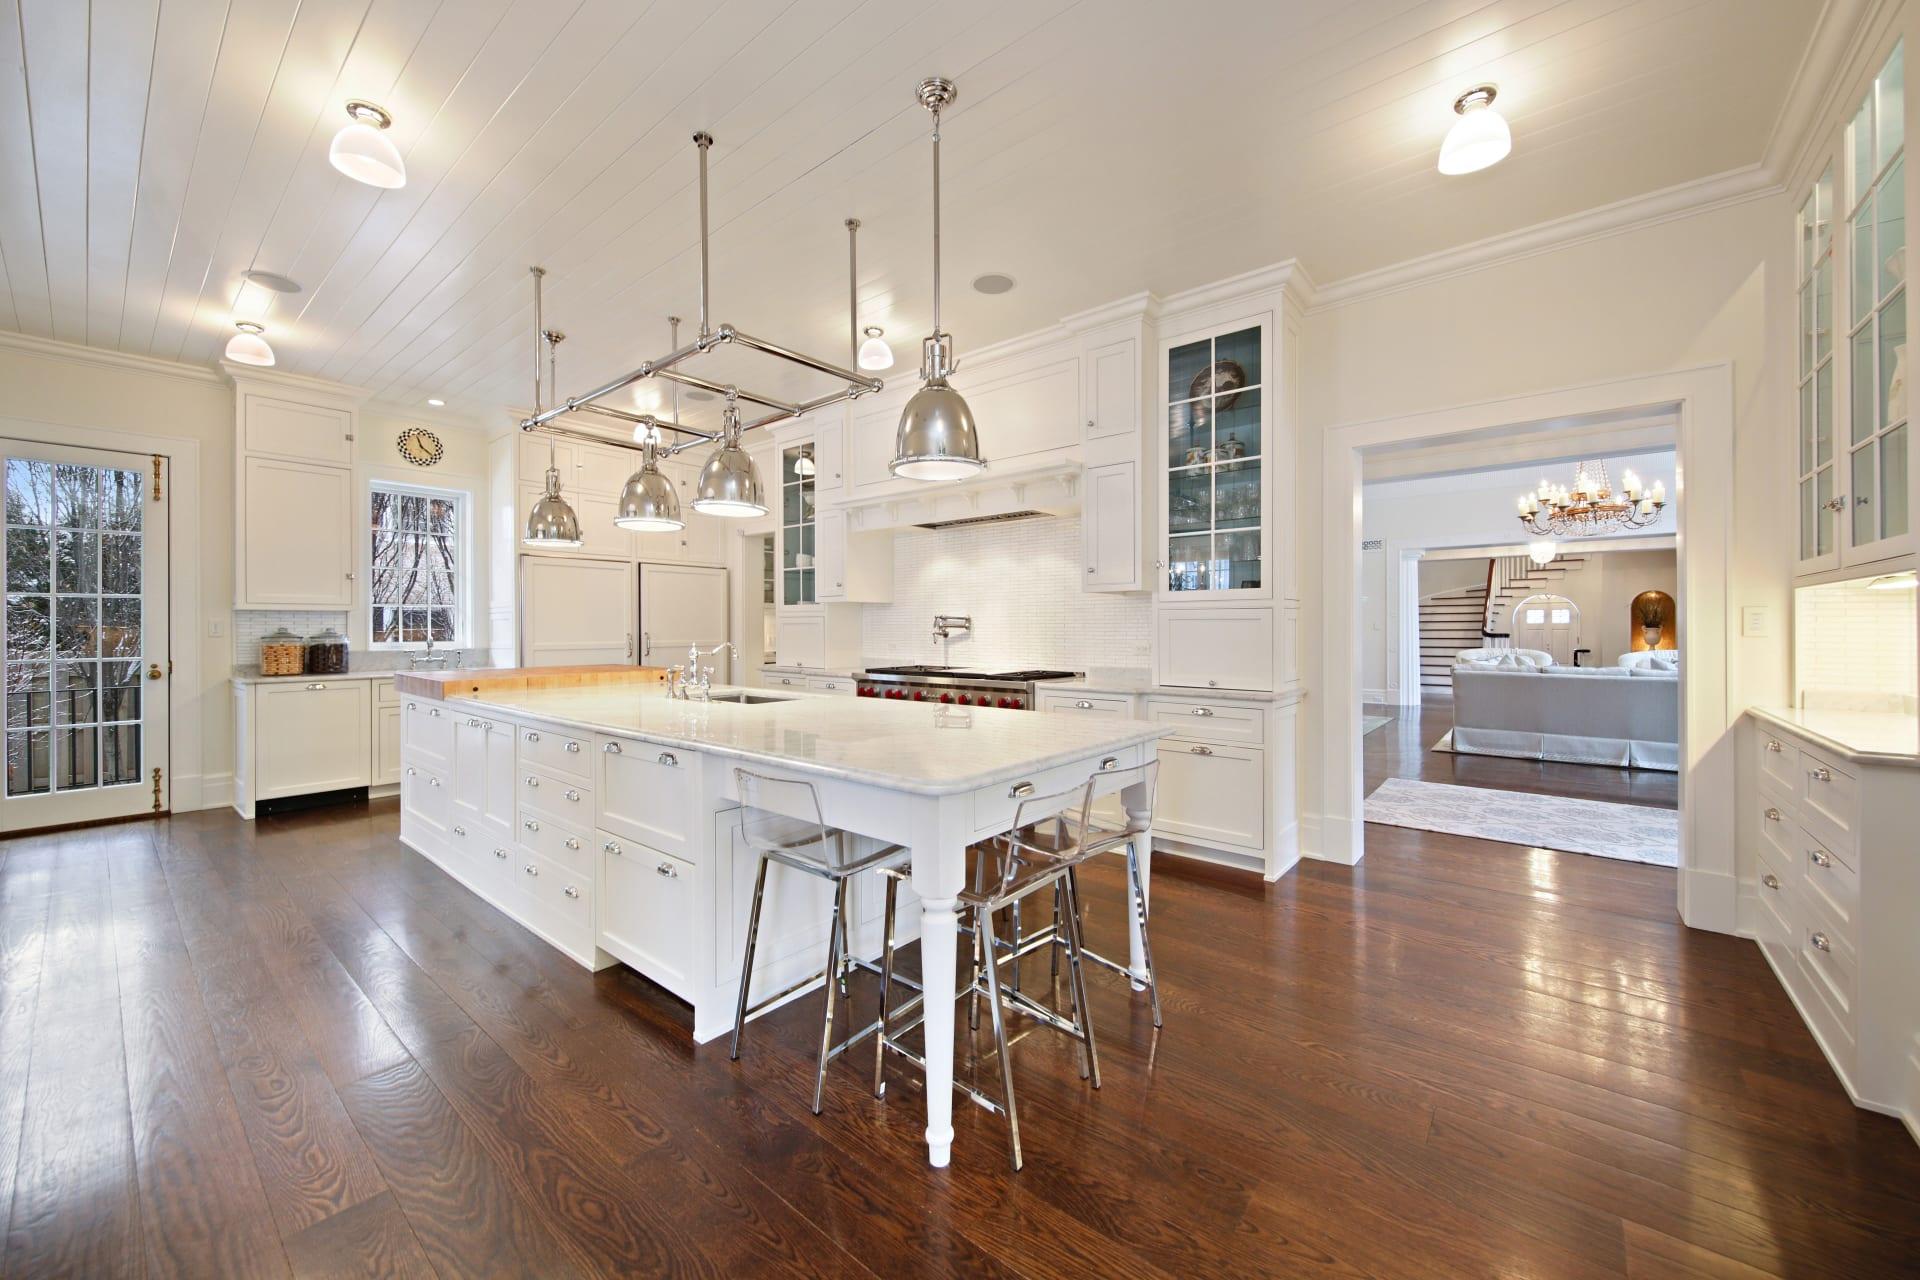 Lavish living awaits in this East Coast inspired estate